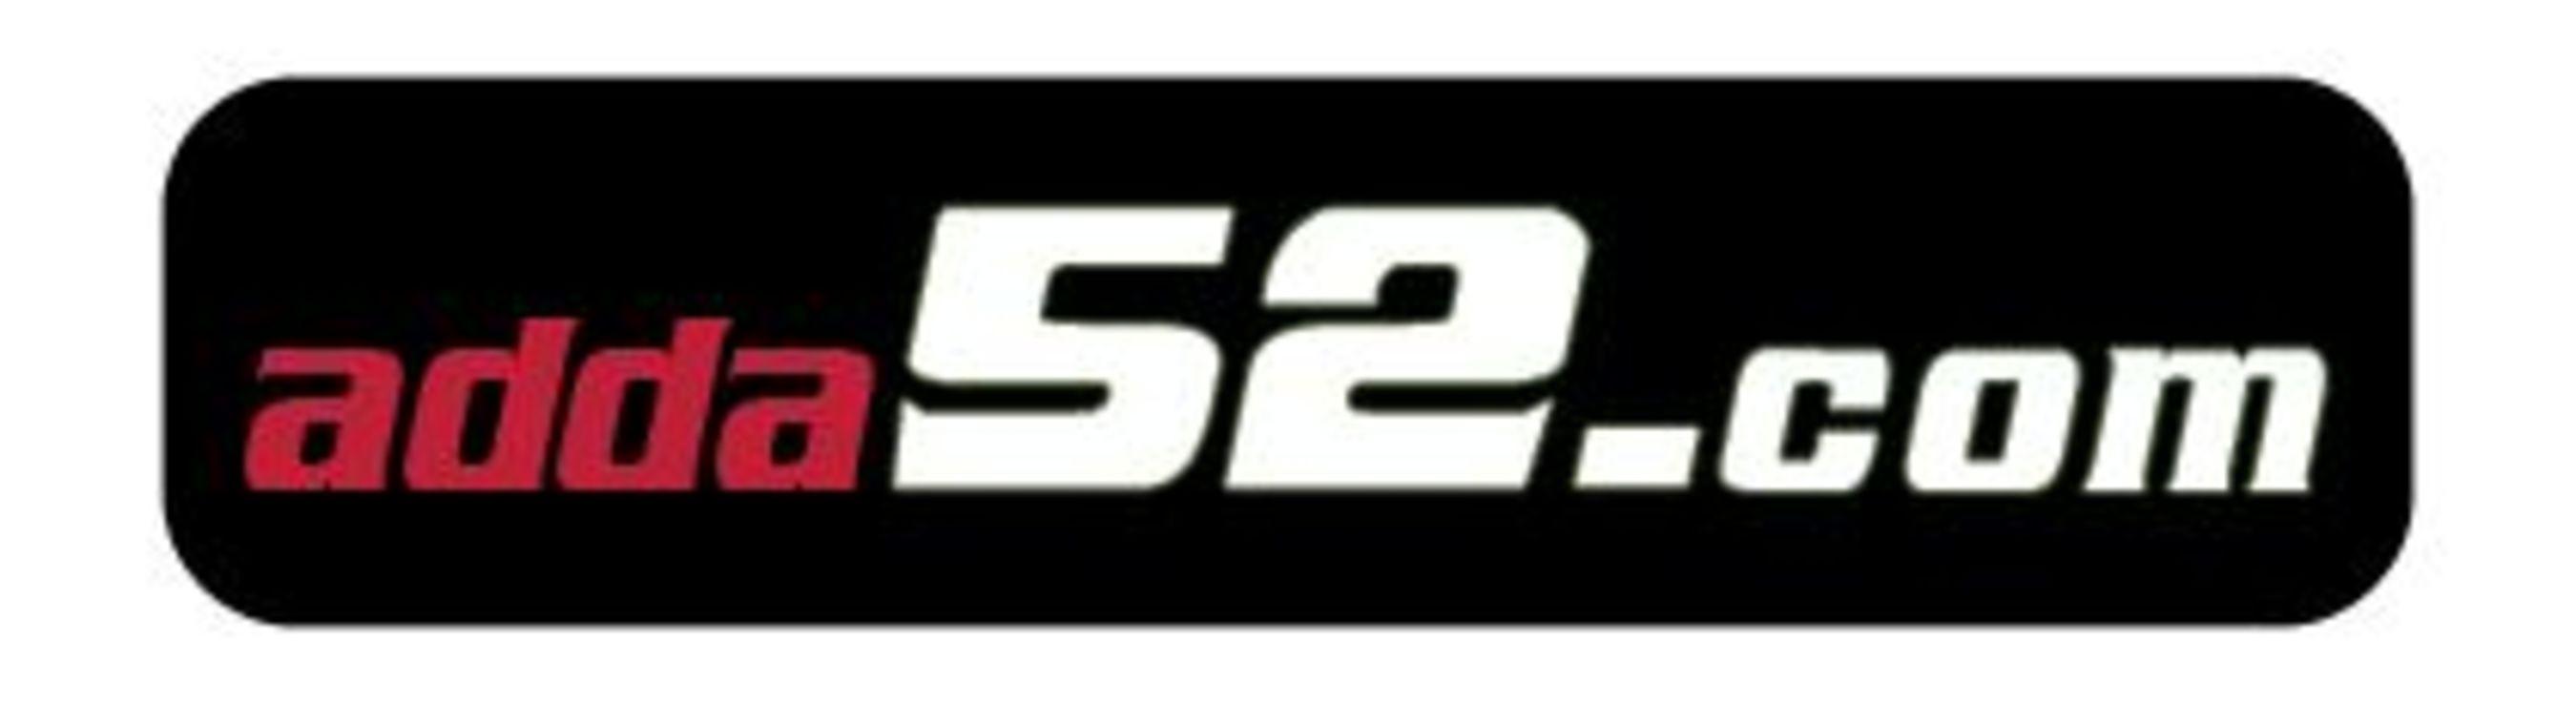 Adda52.com - India's Largest Online Gaming Site (PRNewsFoto/adda52.com)